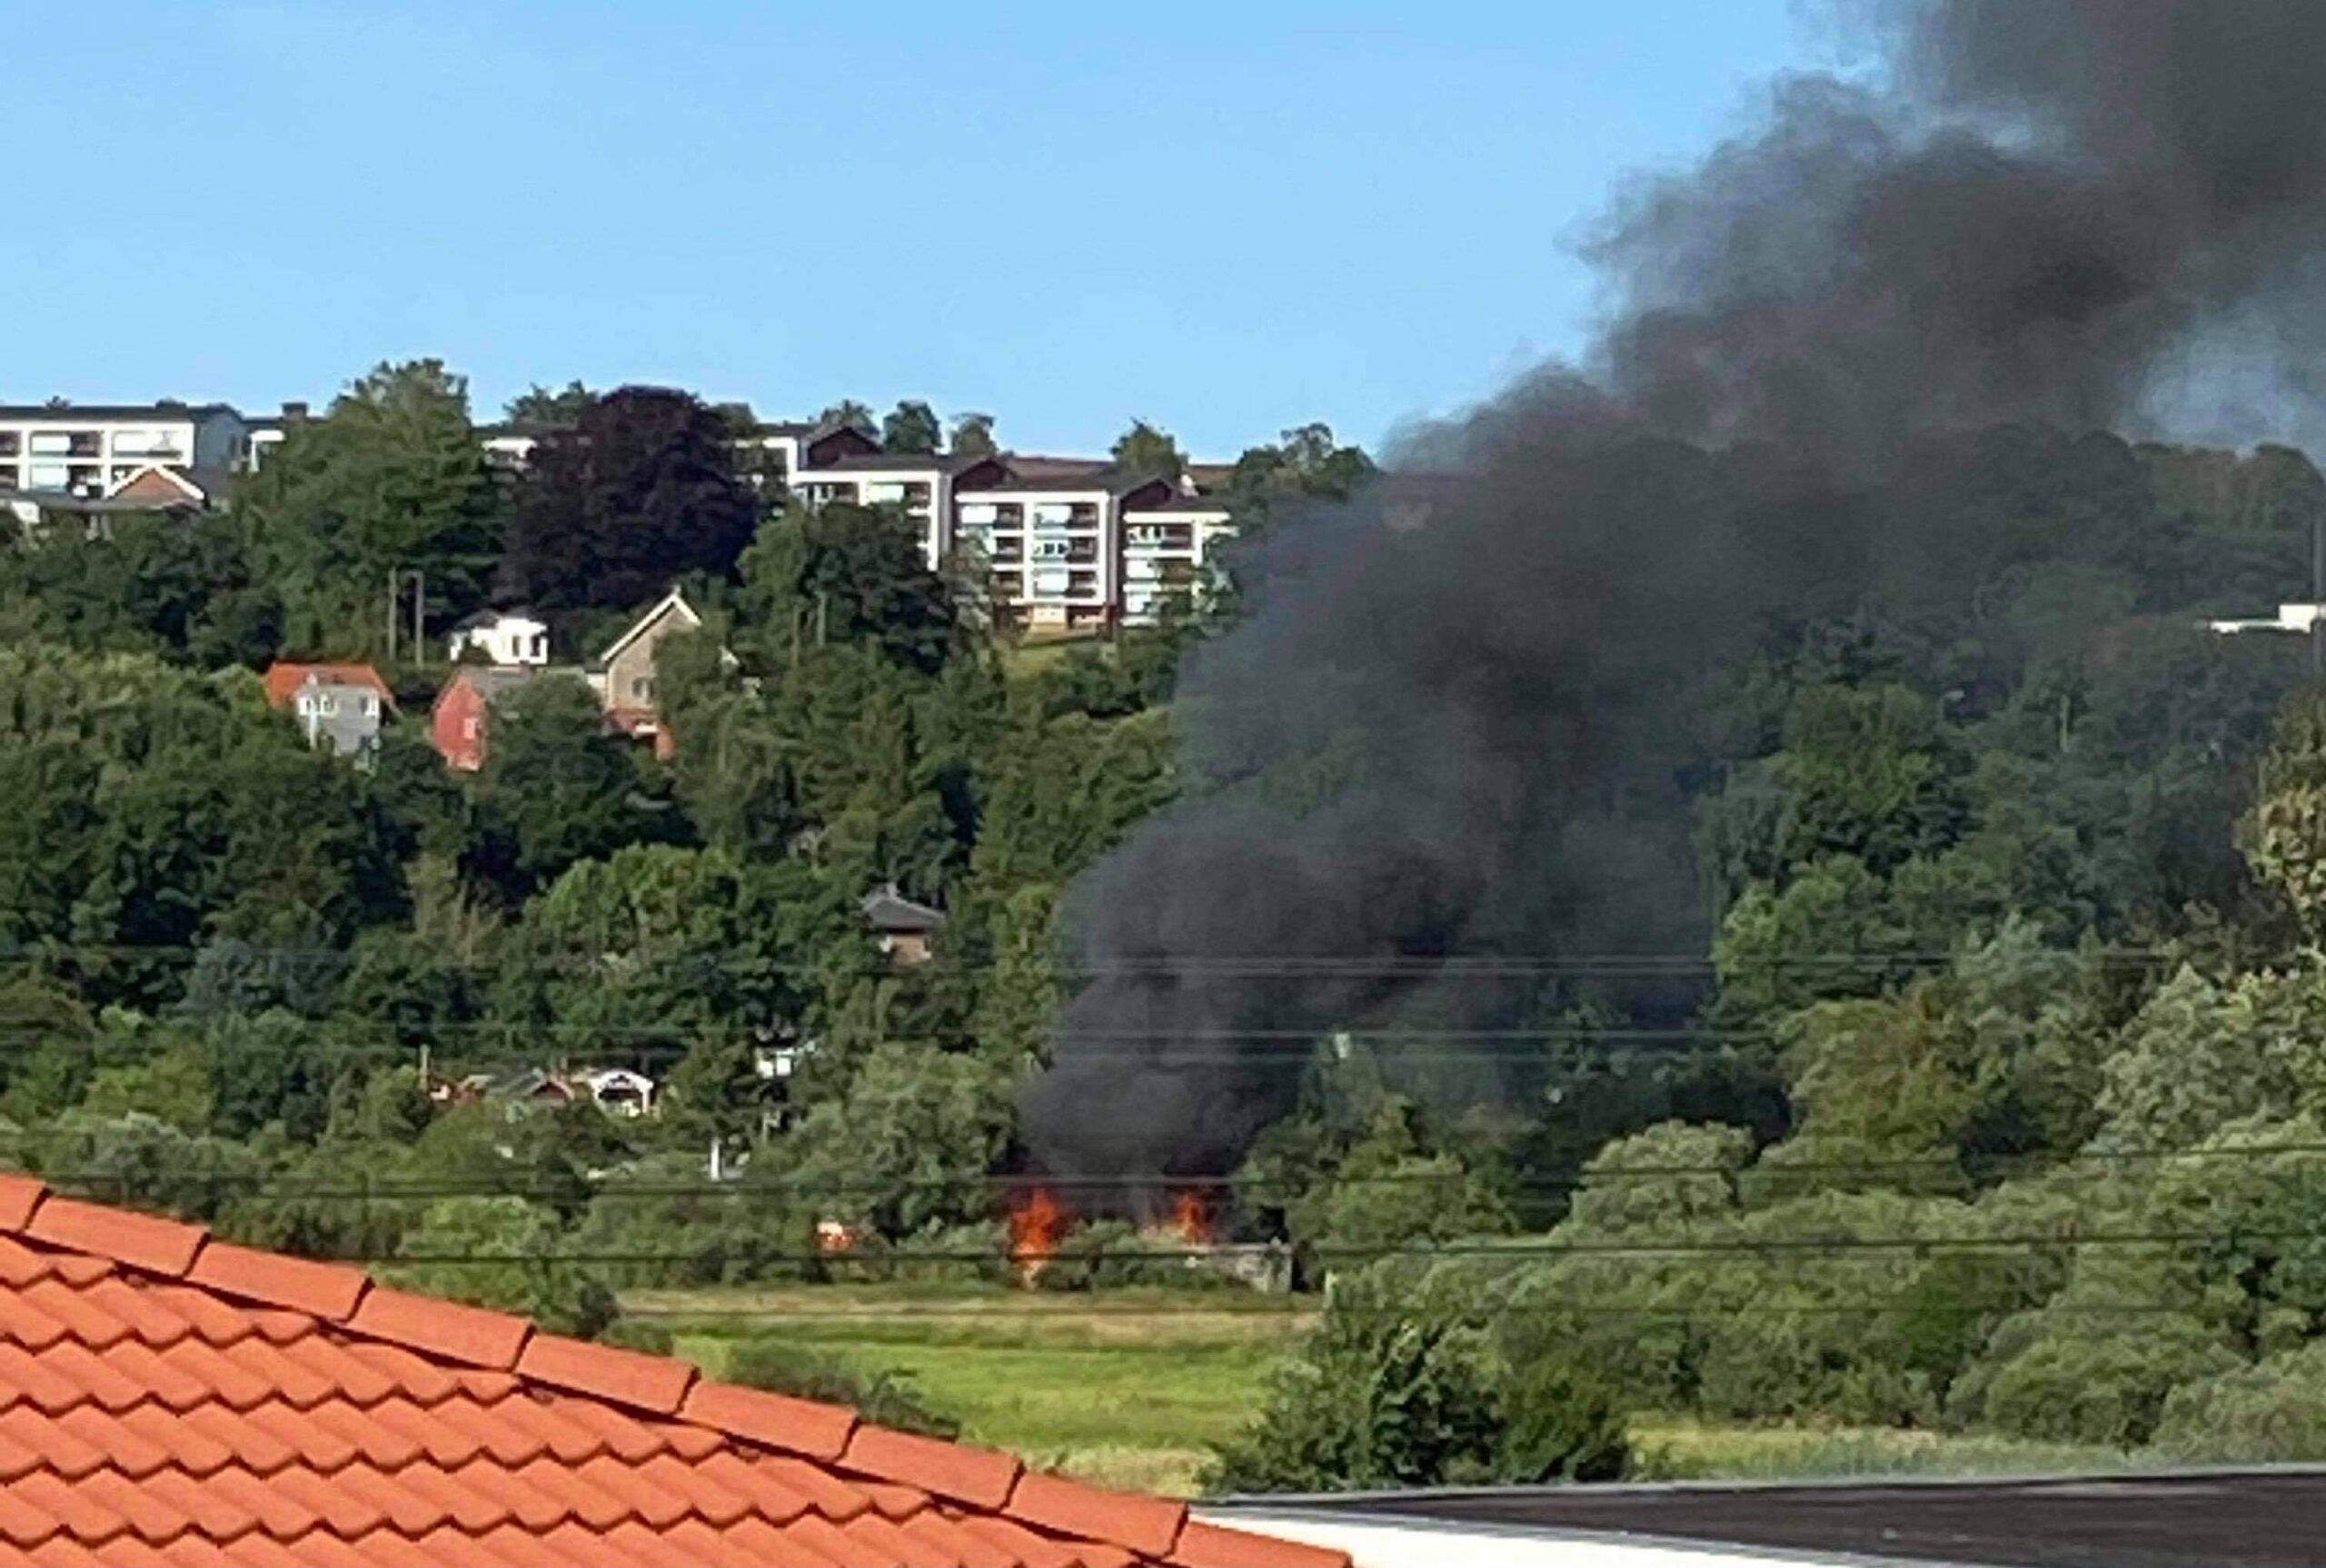 Voldsom brand i Kolonihave - Kolding